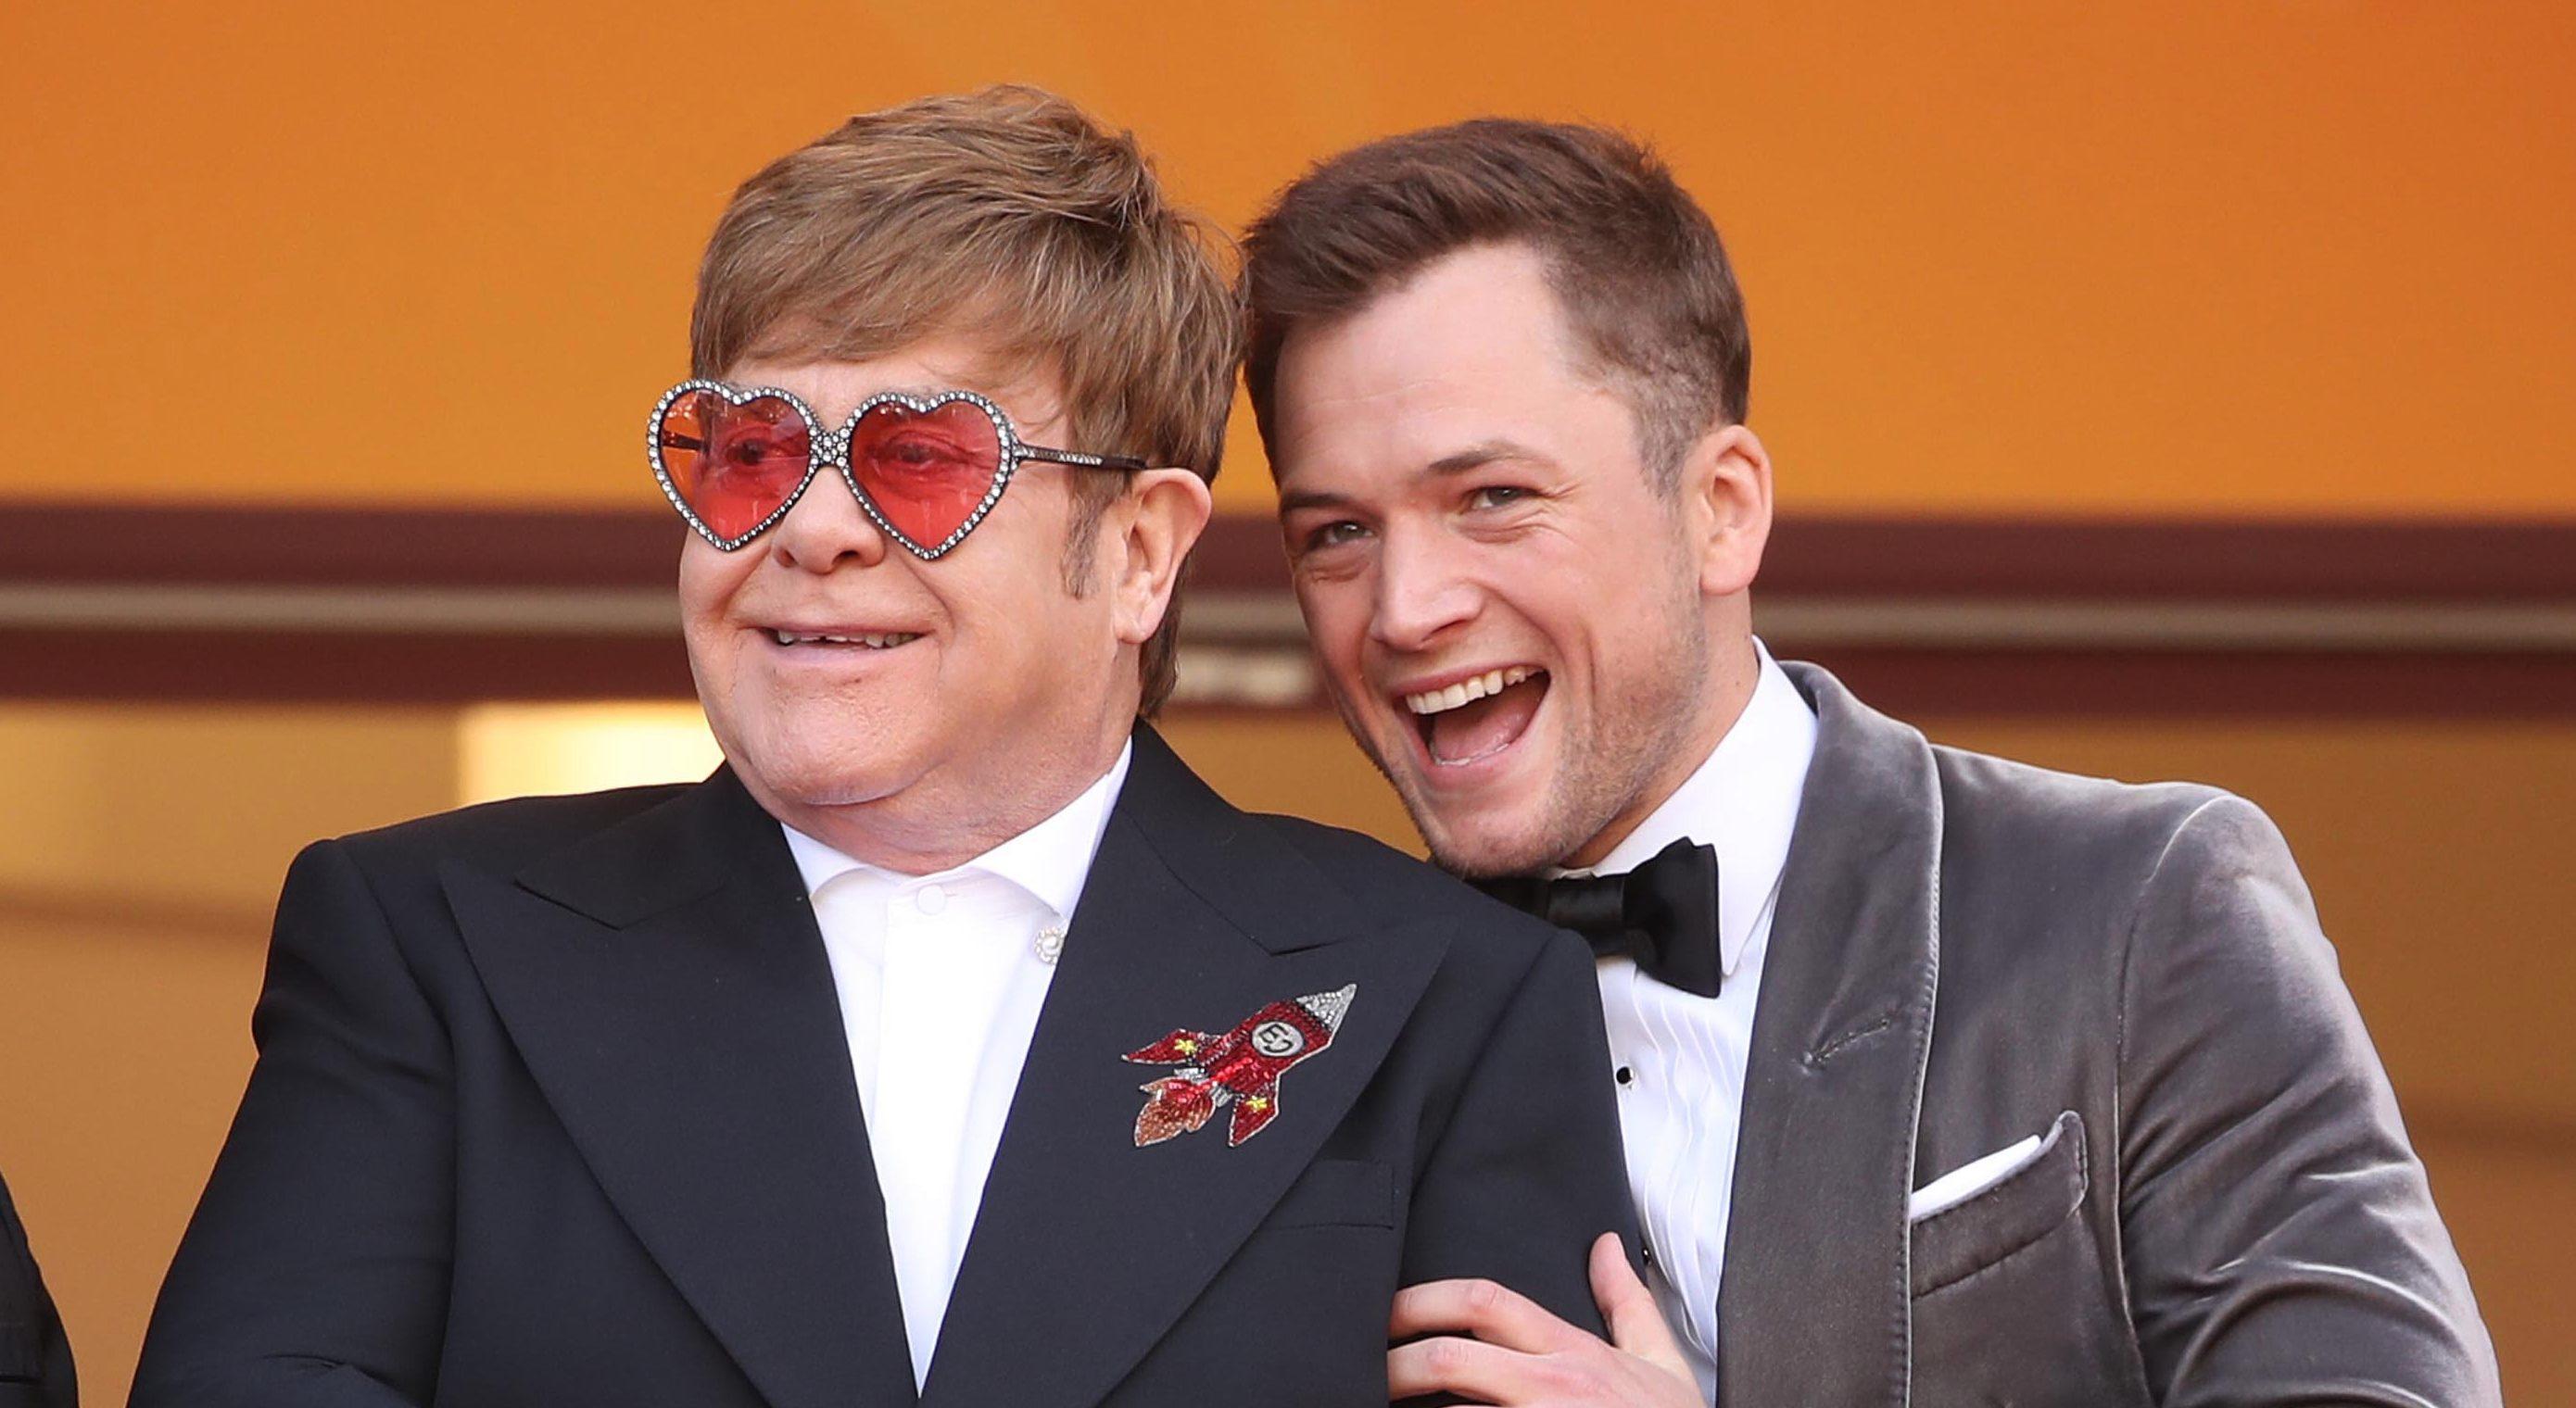 Taron Egerton busted by Elton John's security while raiding singer's fridge